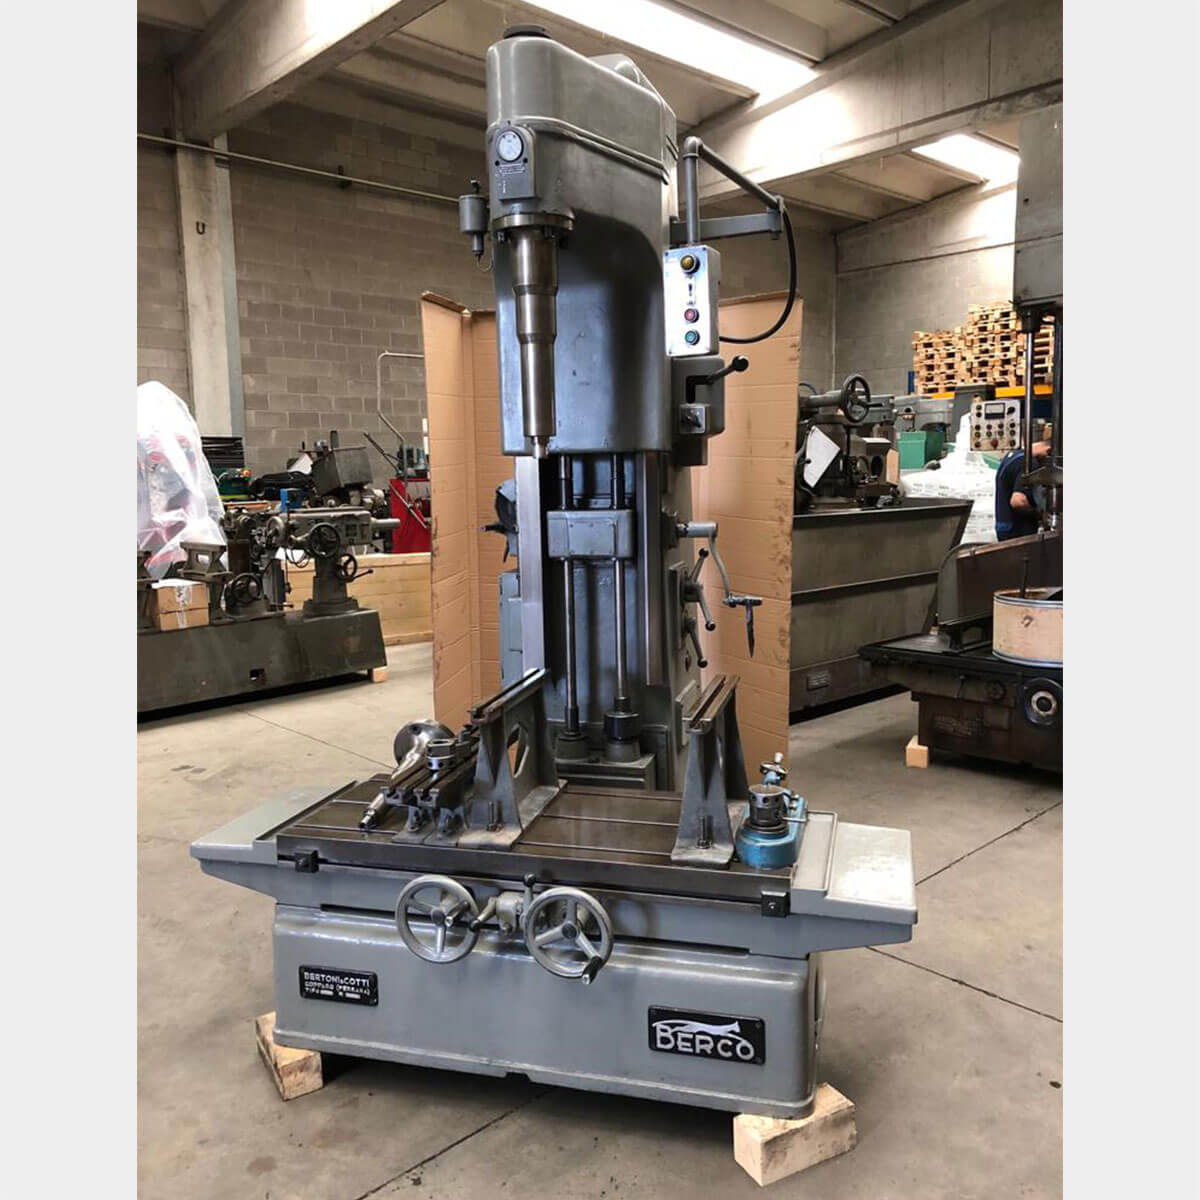 mu415 berco ac750 cylinder boring machine 01